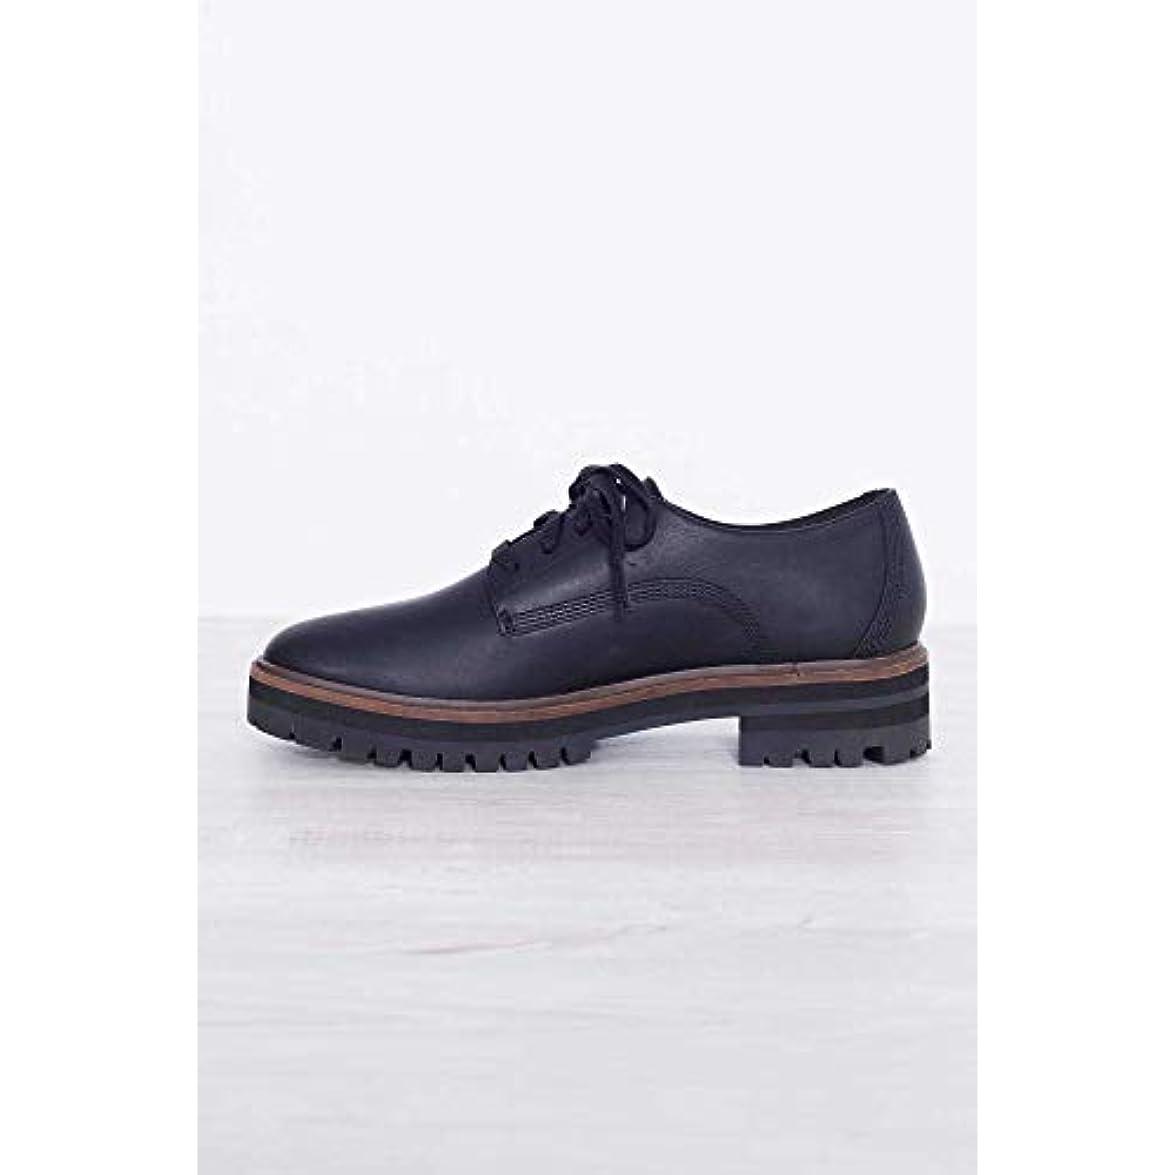 Timberland London Square Shoe Per Donna